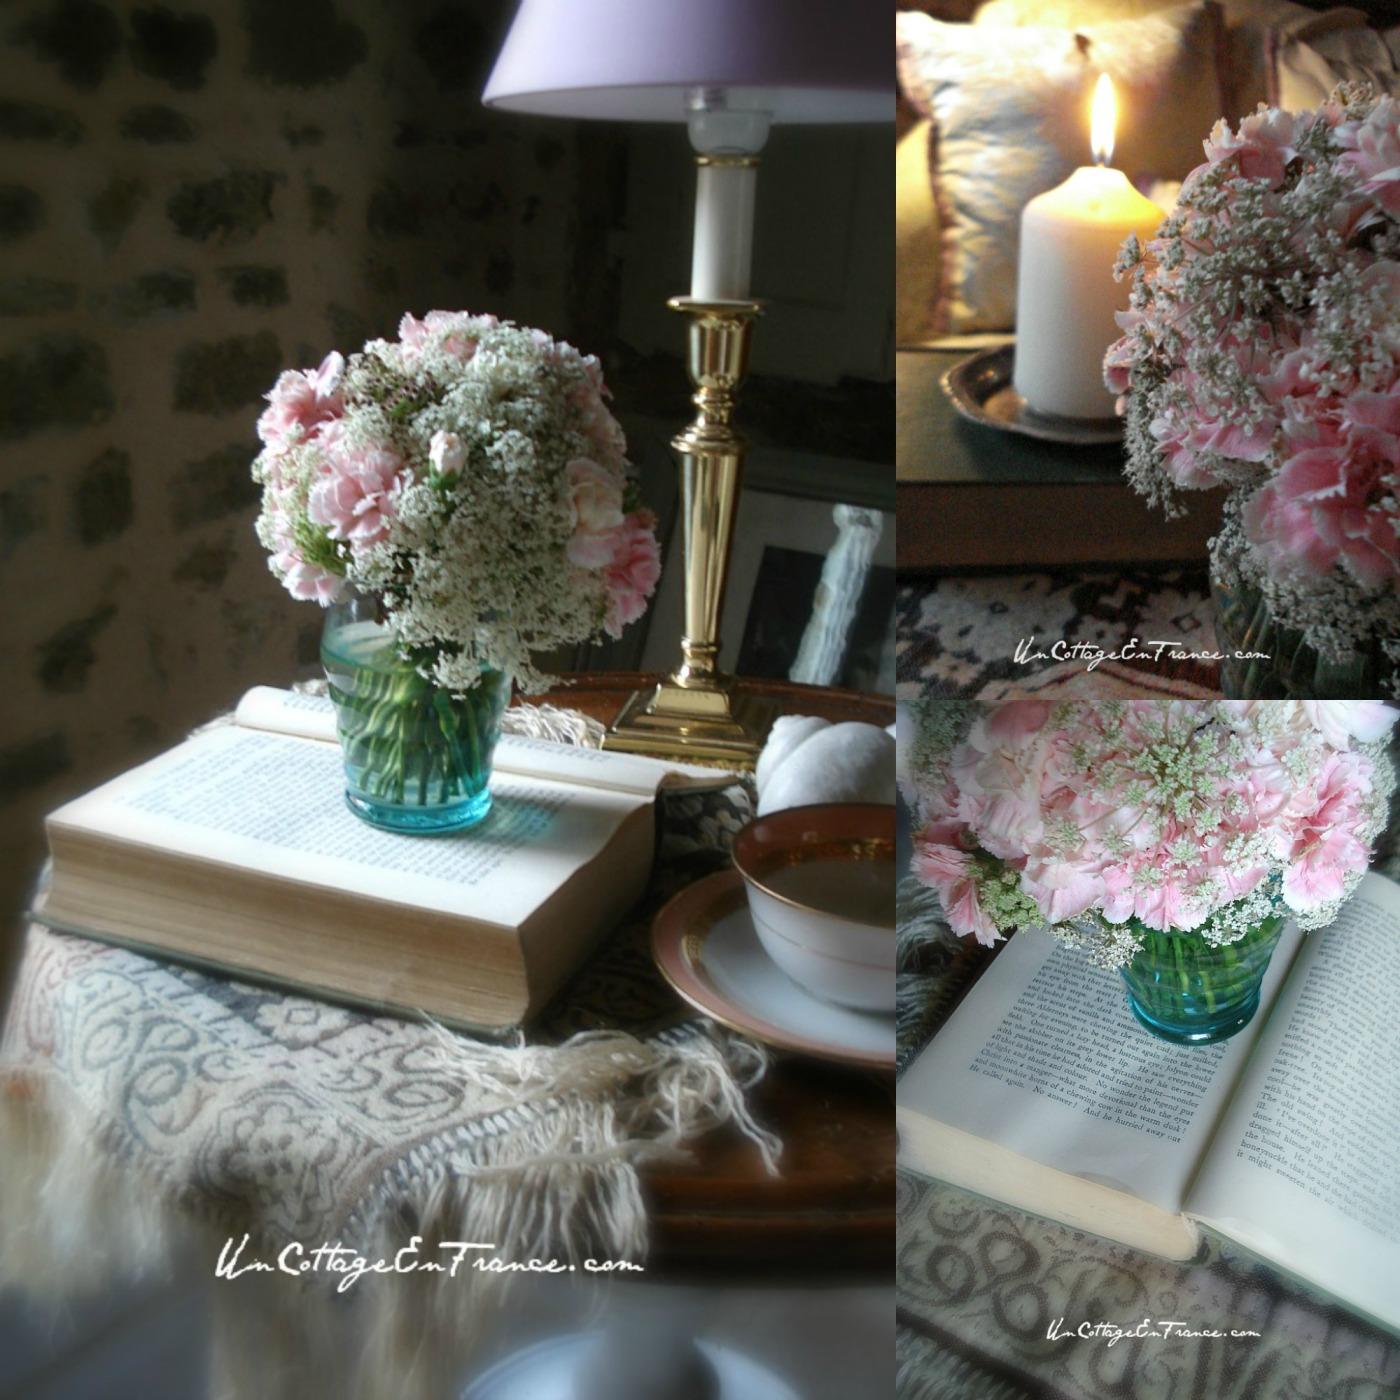 httpuncottageenfrance.com20141012oeillets-roses-pink-carnations 6